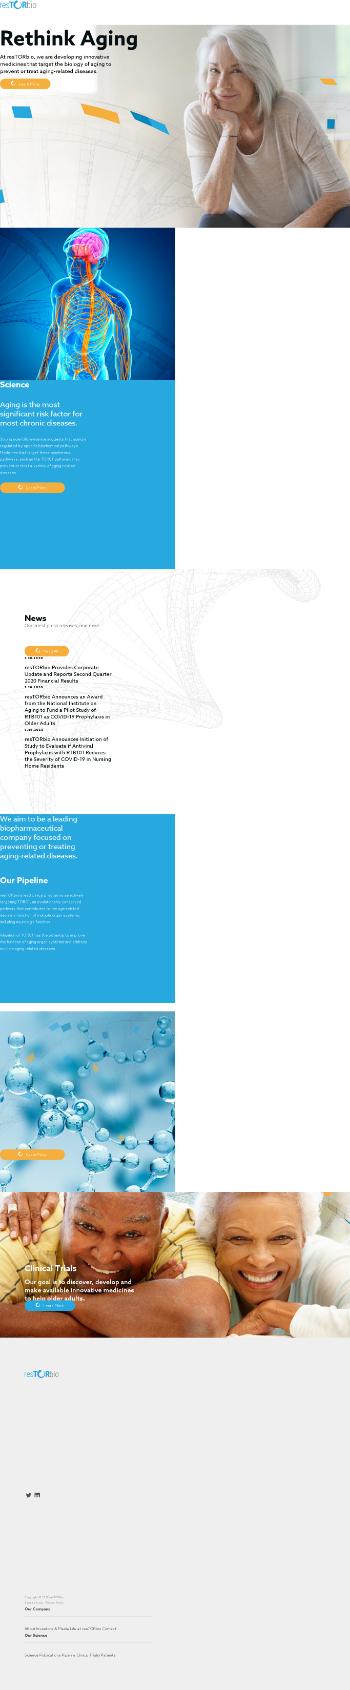 resTORbio, Inc. Website Screenshot